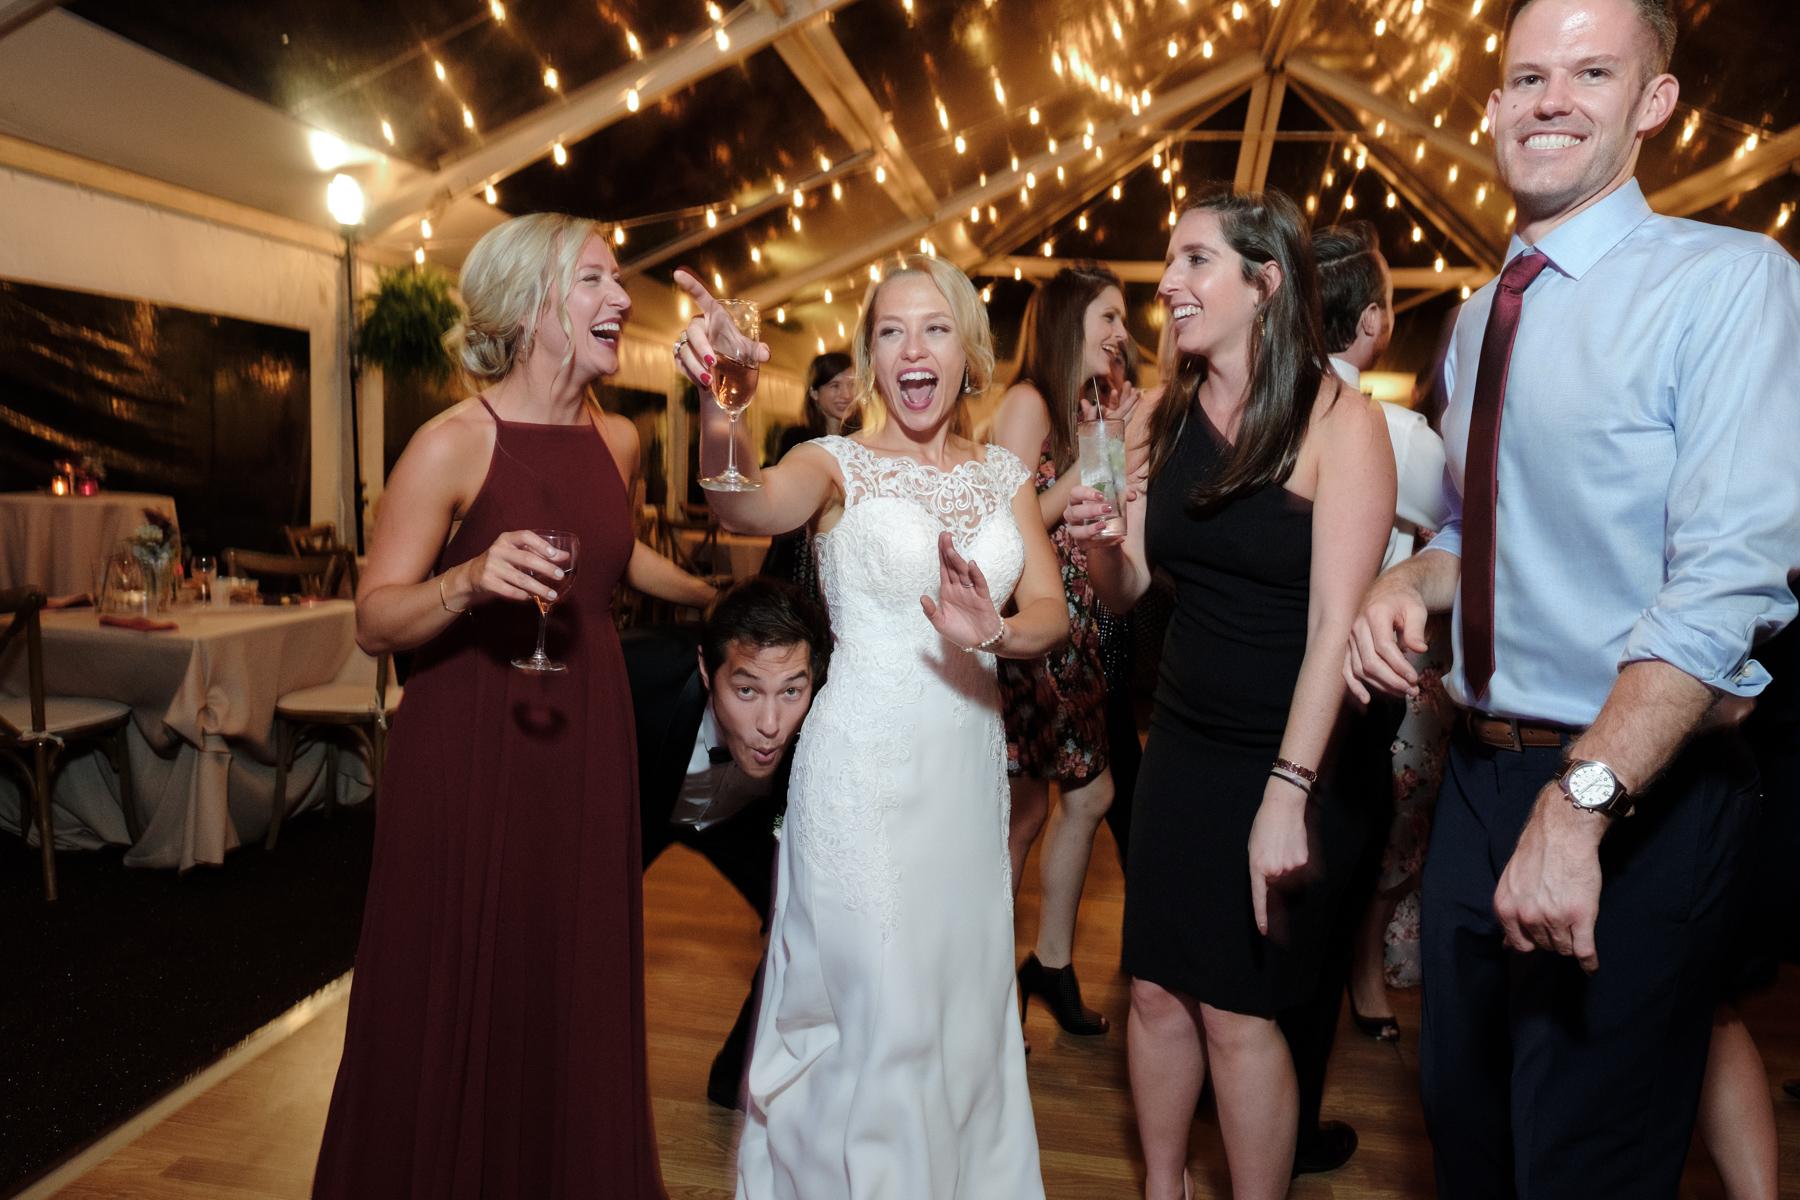 2017_BAP_KalliMatt_Gleneagles_CountryClub_Lemont_Wedding-98.jpg